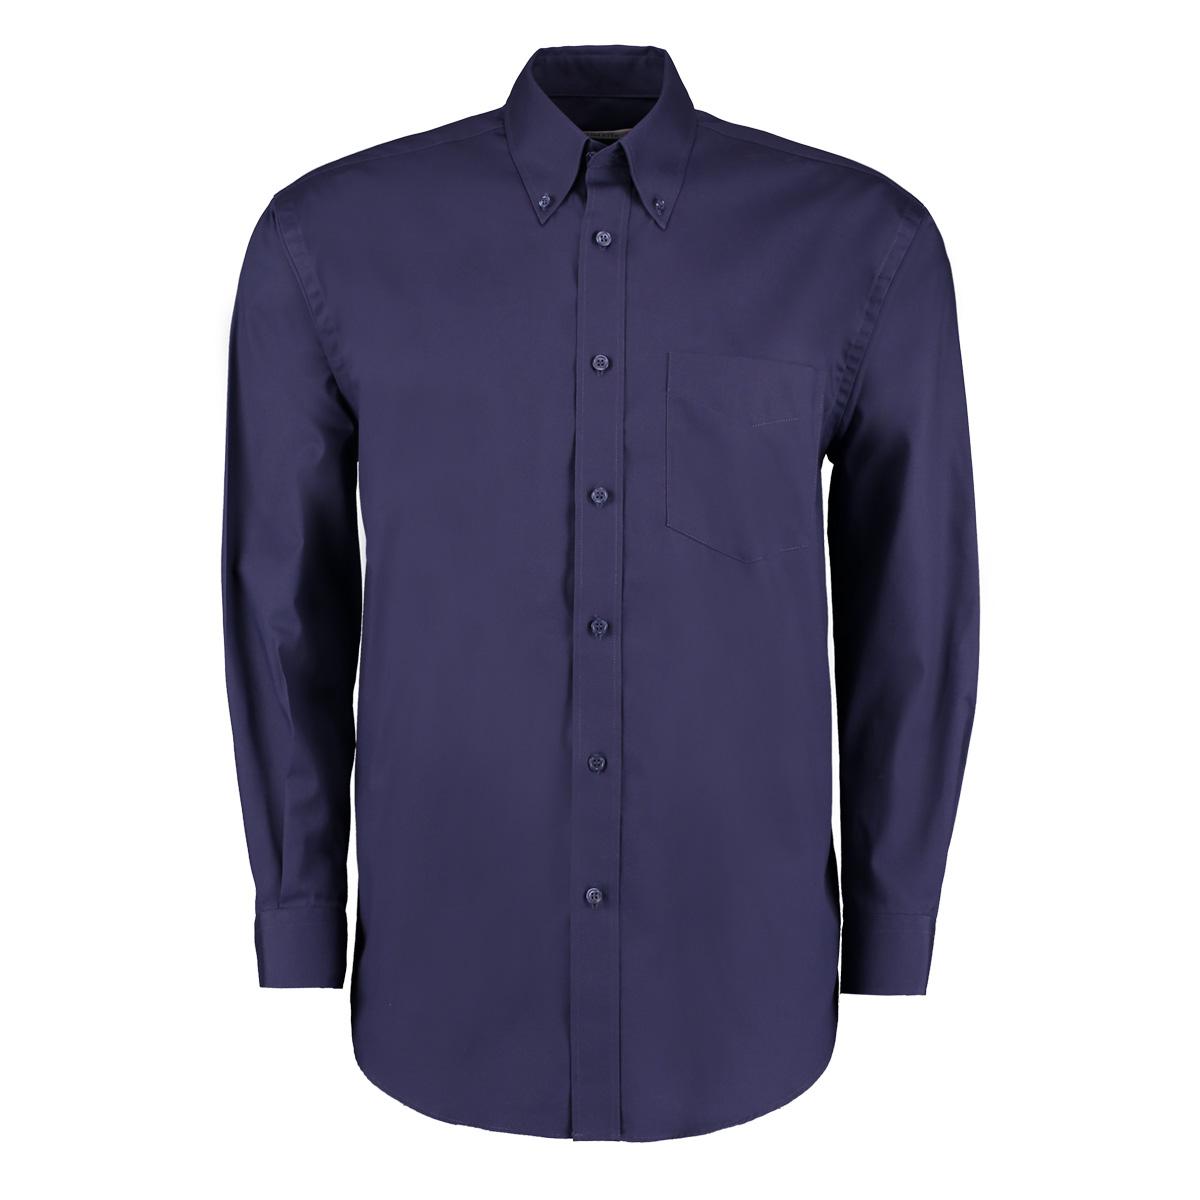 KK105 Corporate Oxford Shirt  Kustom Kit